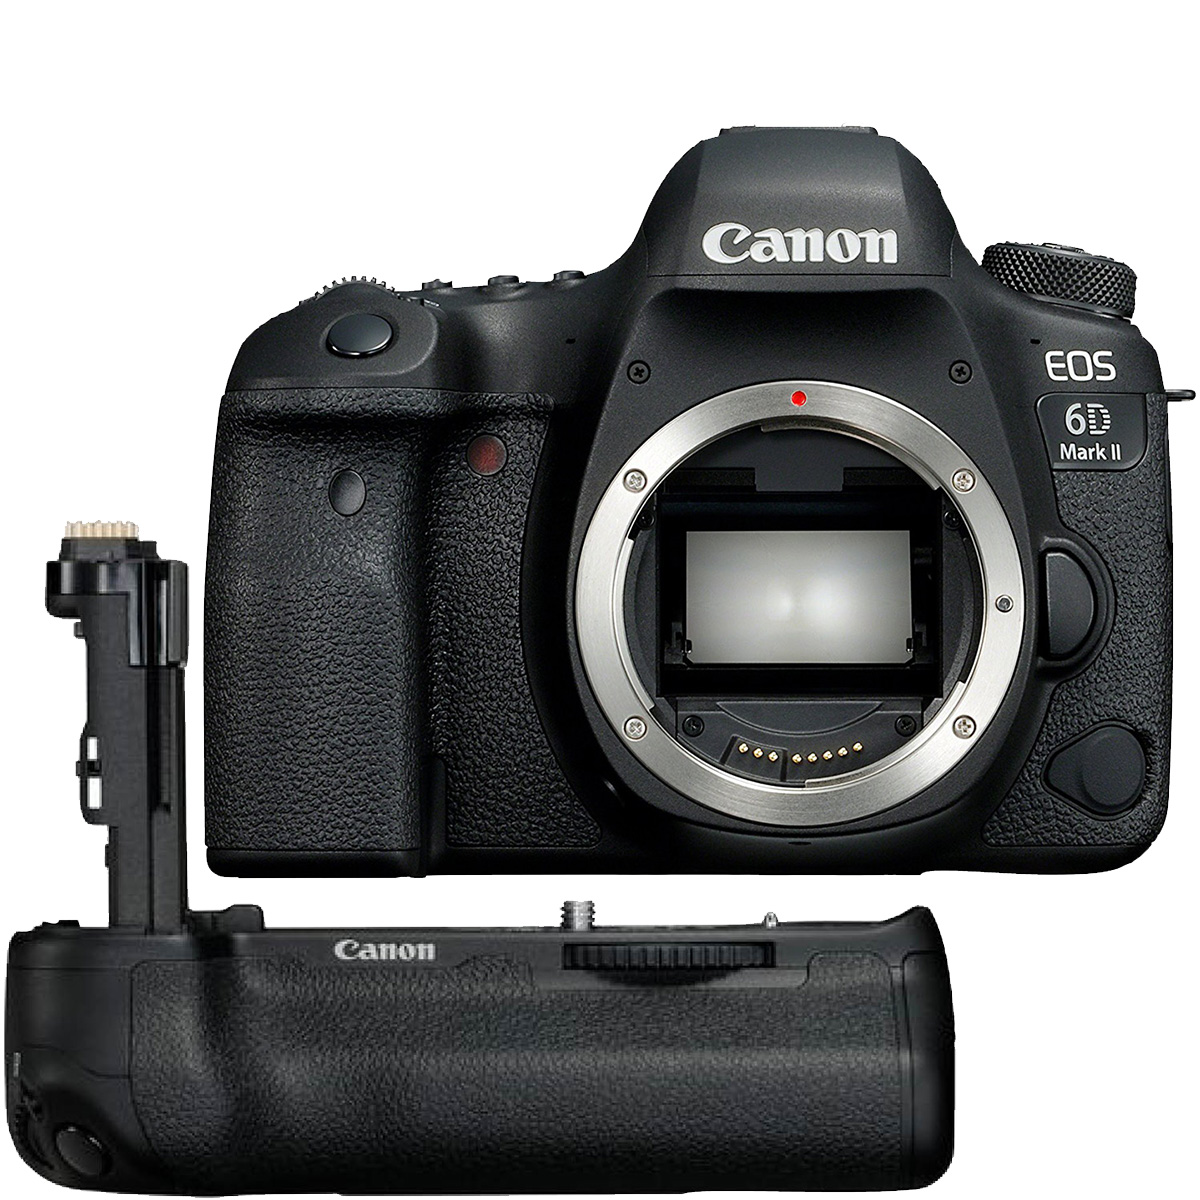 Canon EOS 6D Mark II + BG-E 21 Batteriegriff